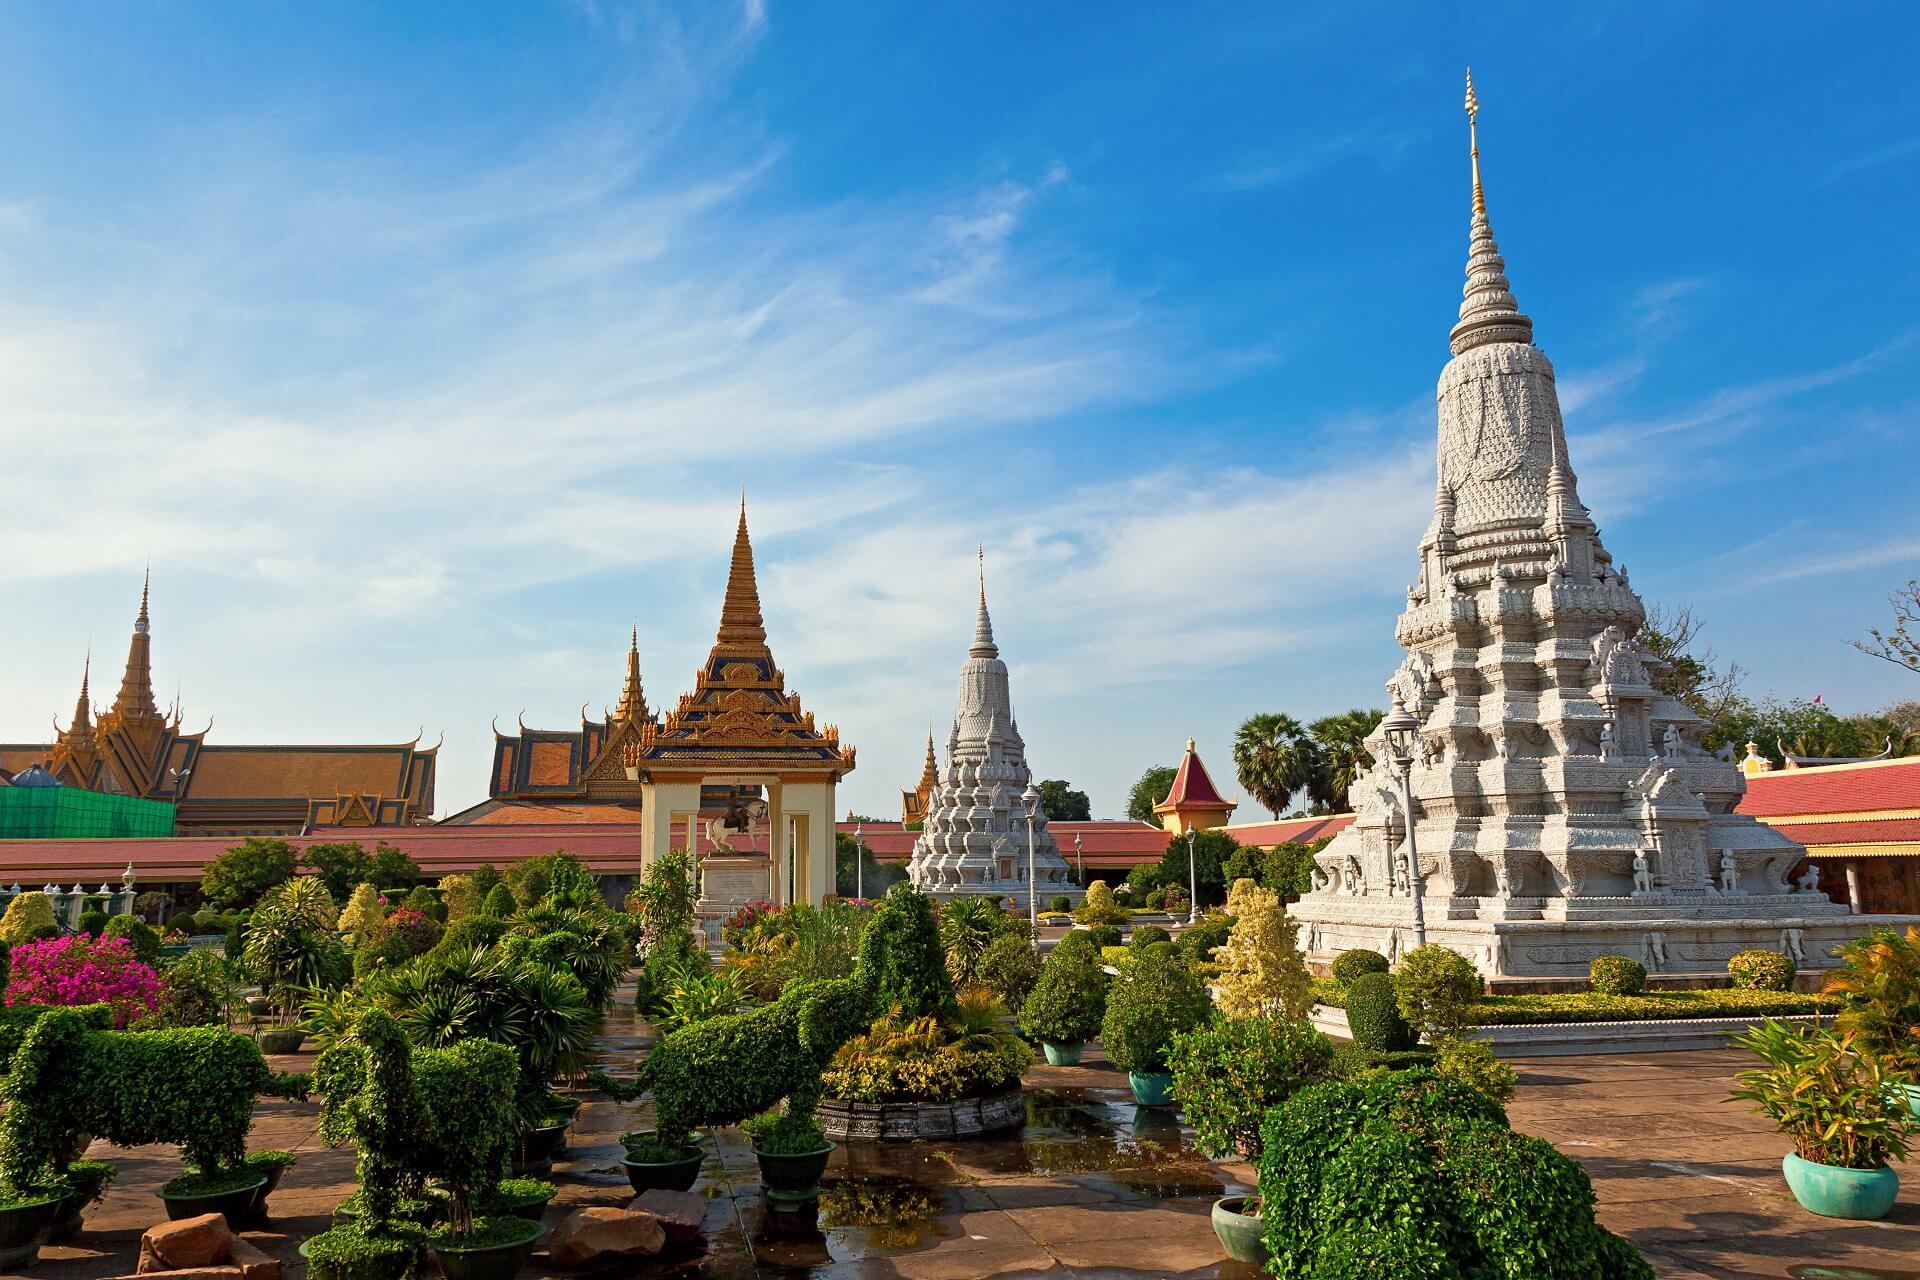 Die Tempelanlage des Royal Palace in Phnom Penh